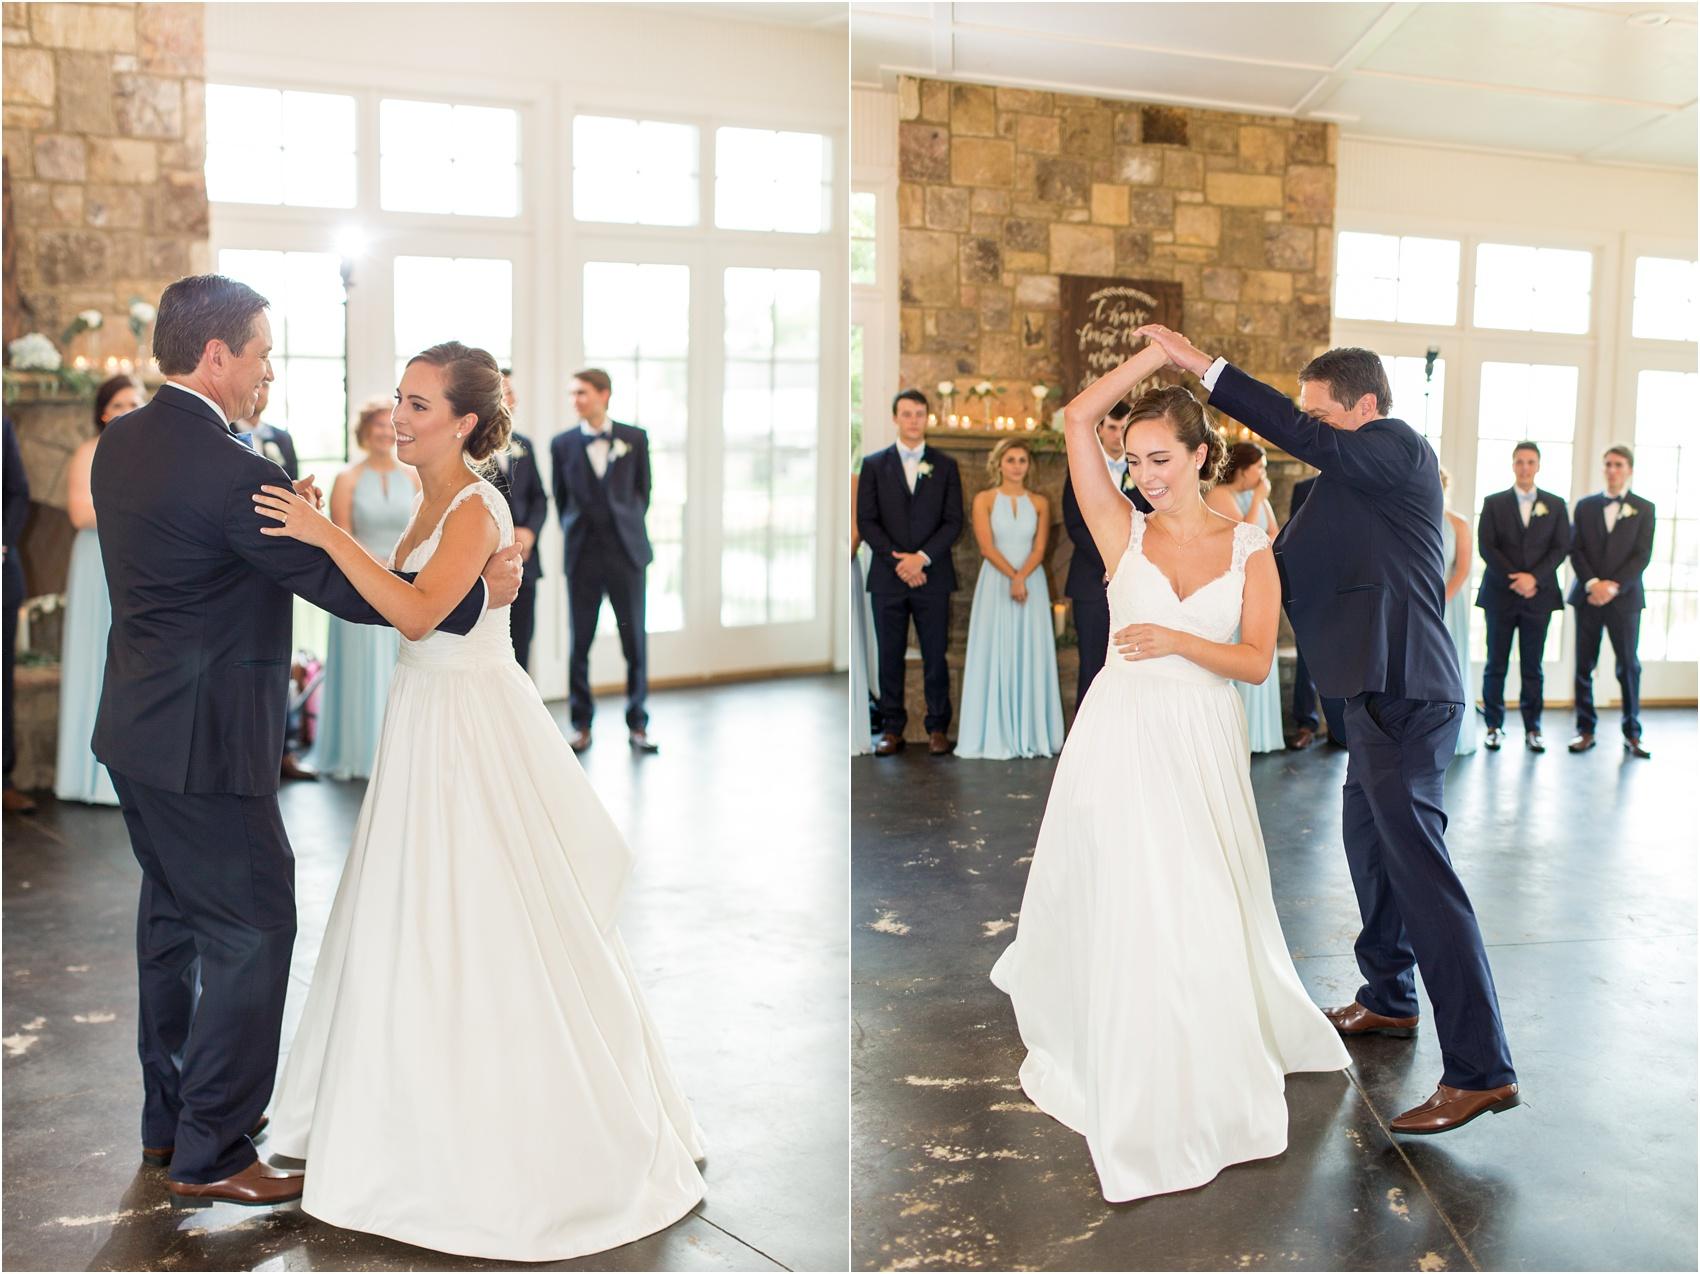 Savannah Eve Photography- Sigl-Adams Wedding- Sneak Peek-72.jpg